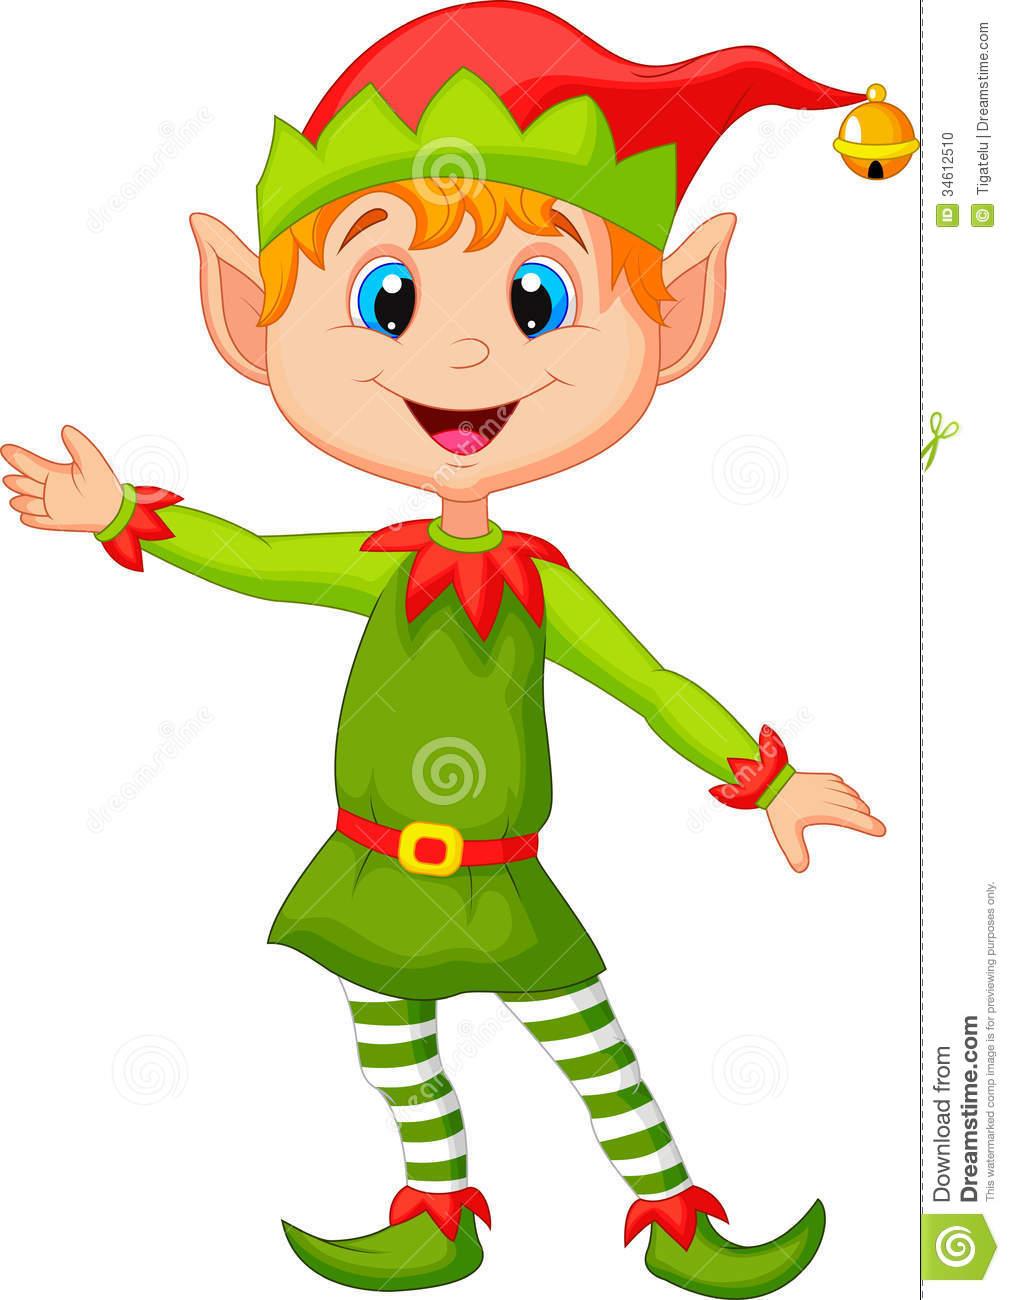 Clip Art Christmas Elf Clipart cartoon elf clipart kid cute christmas presenting stock photo image 34612510